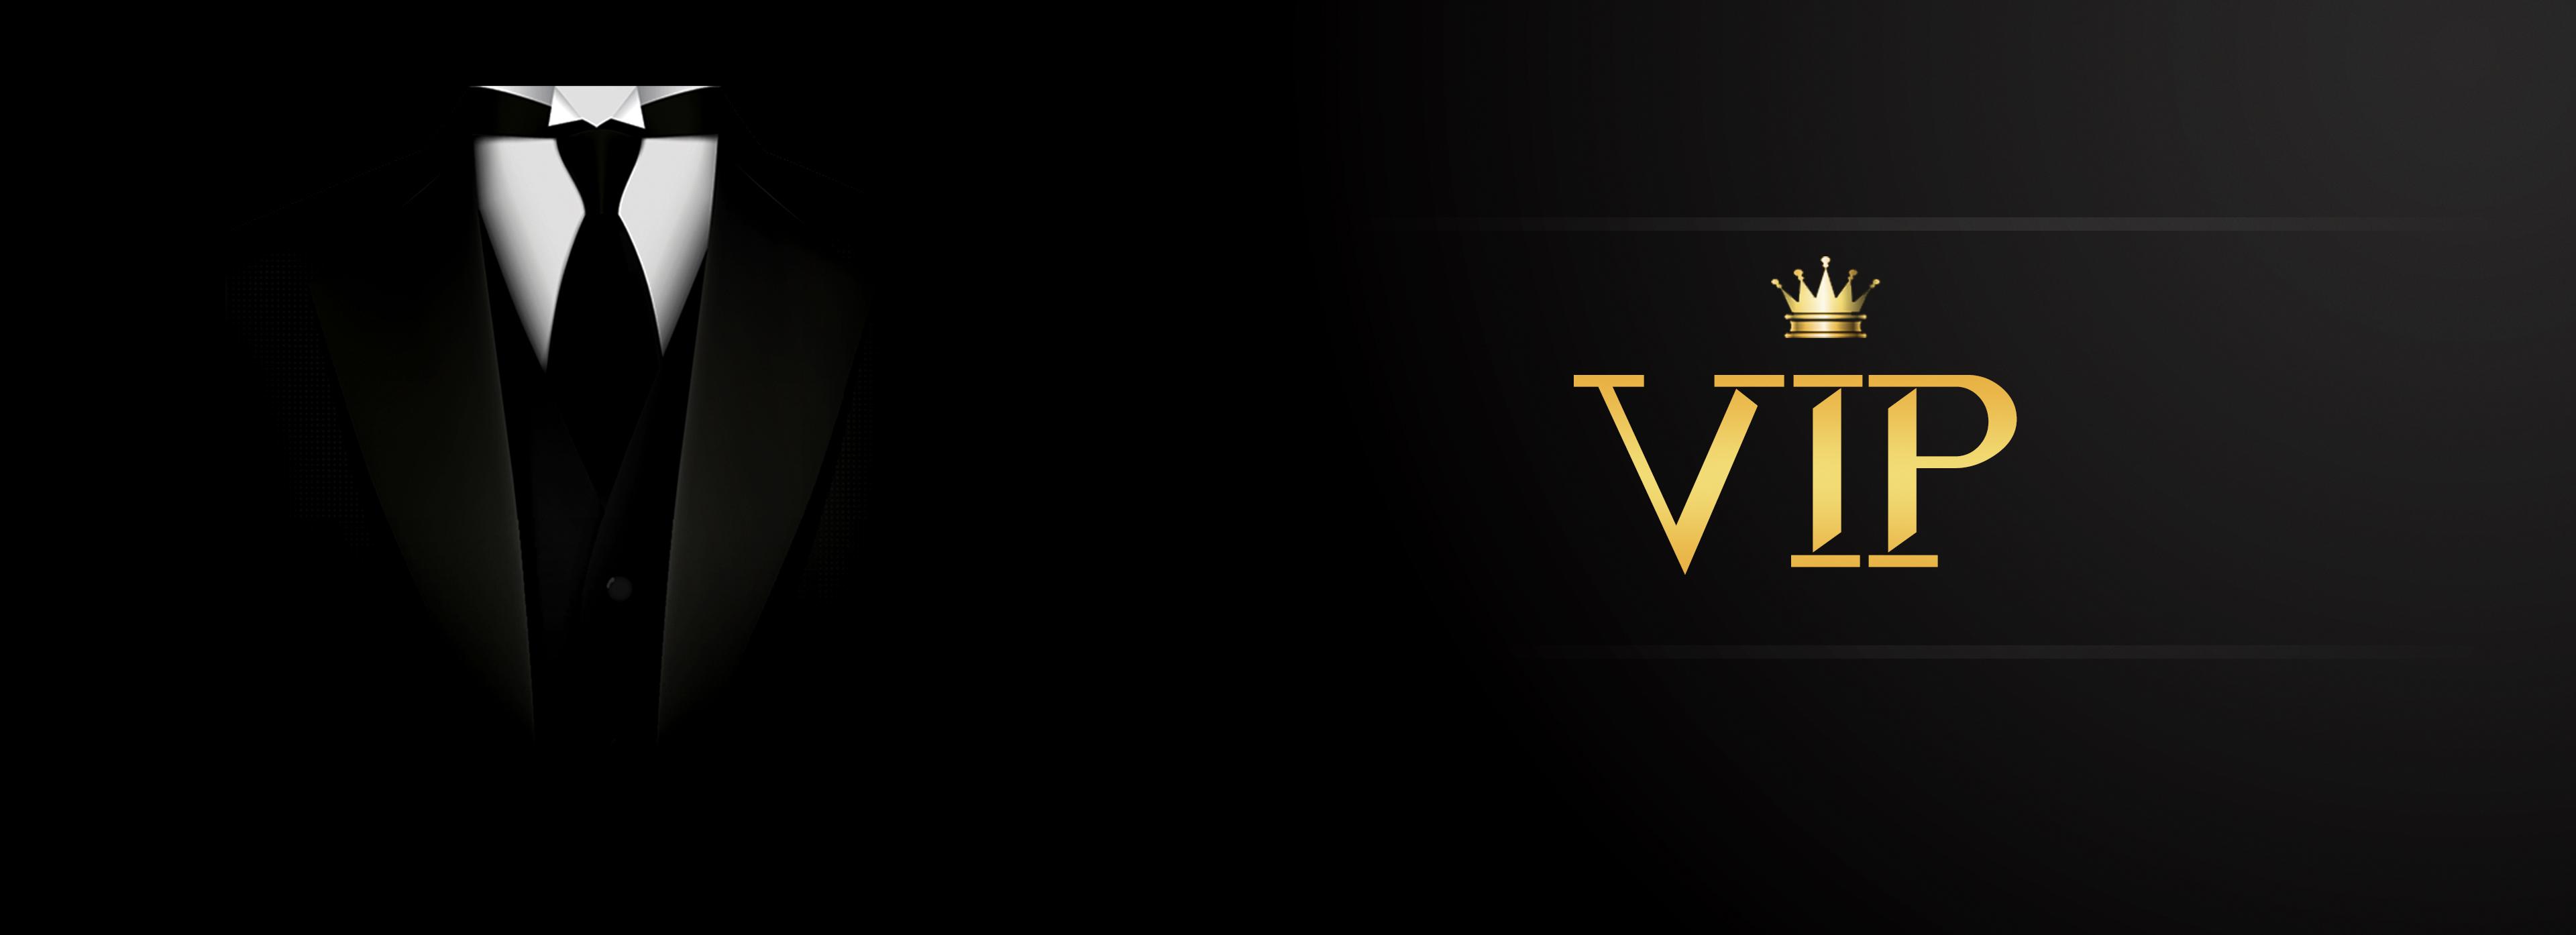 VIP Valet & Concierge Service